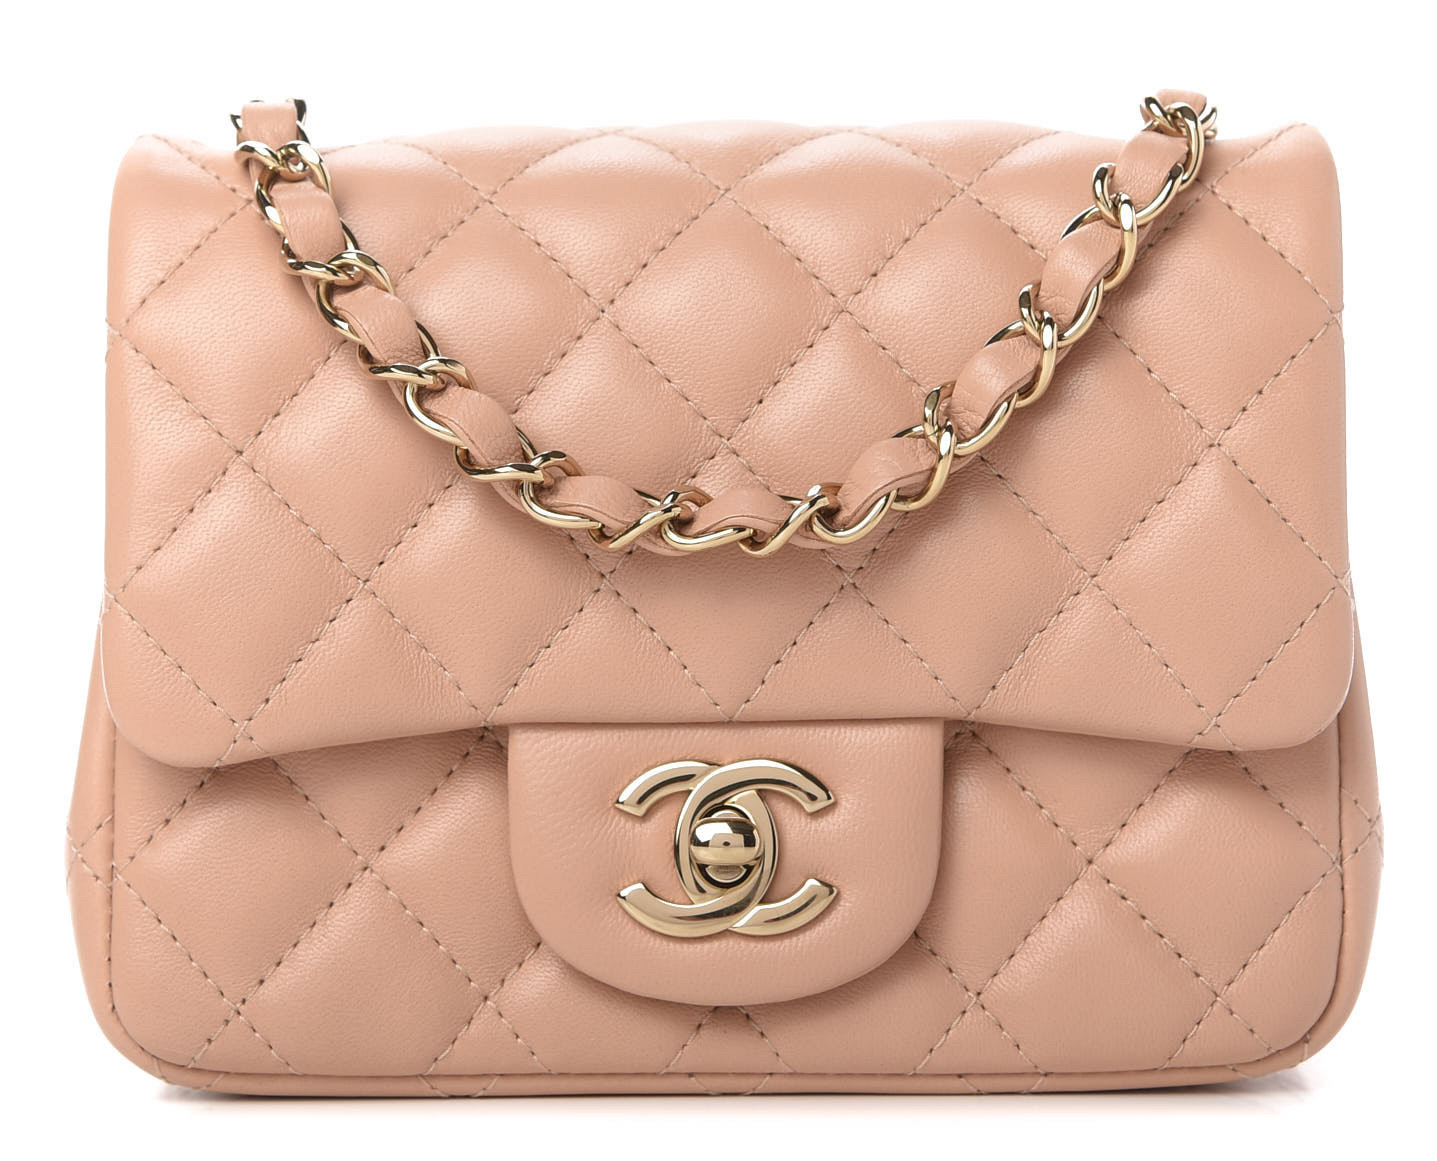 Chanel Square Mini Flap Beige